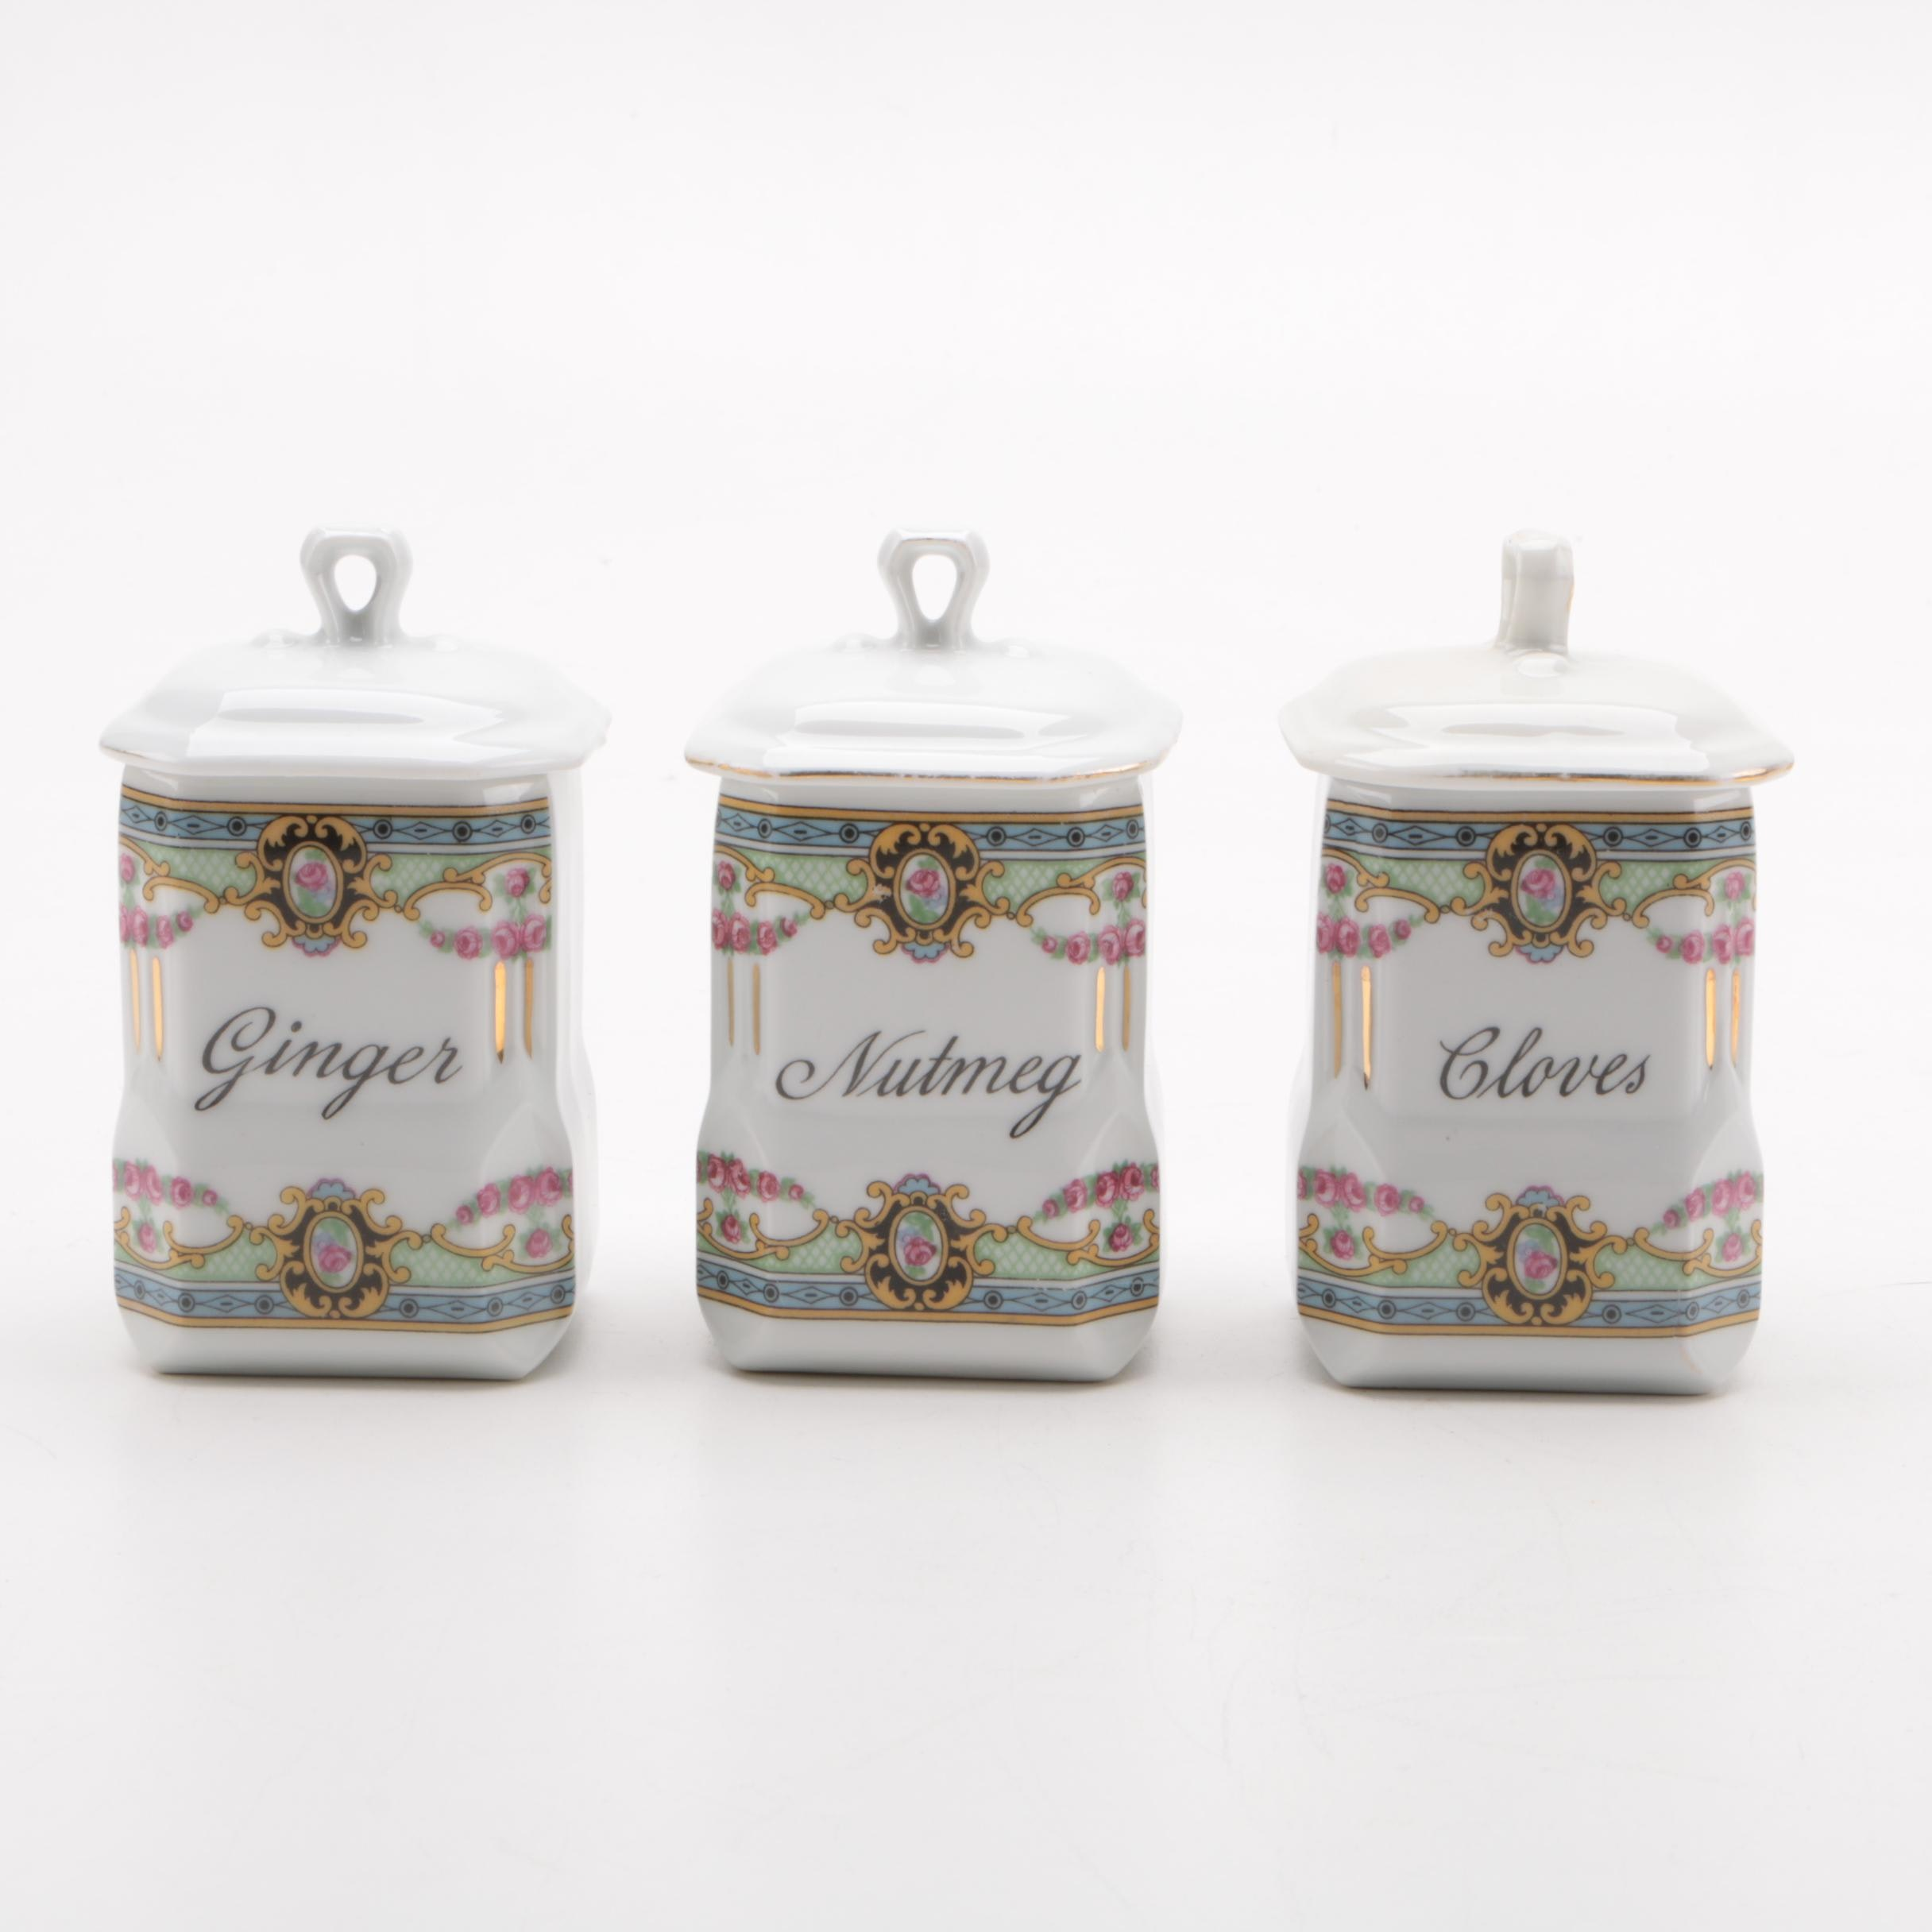 Victoria Czechoslovakia Porcelain Spice Jars